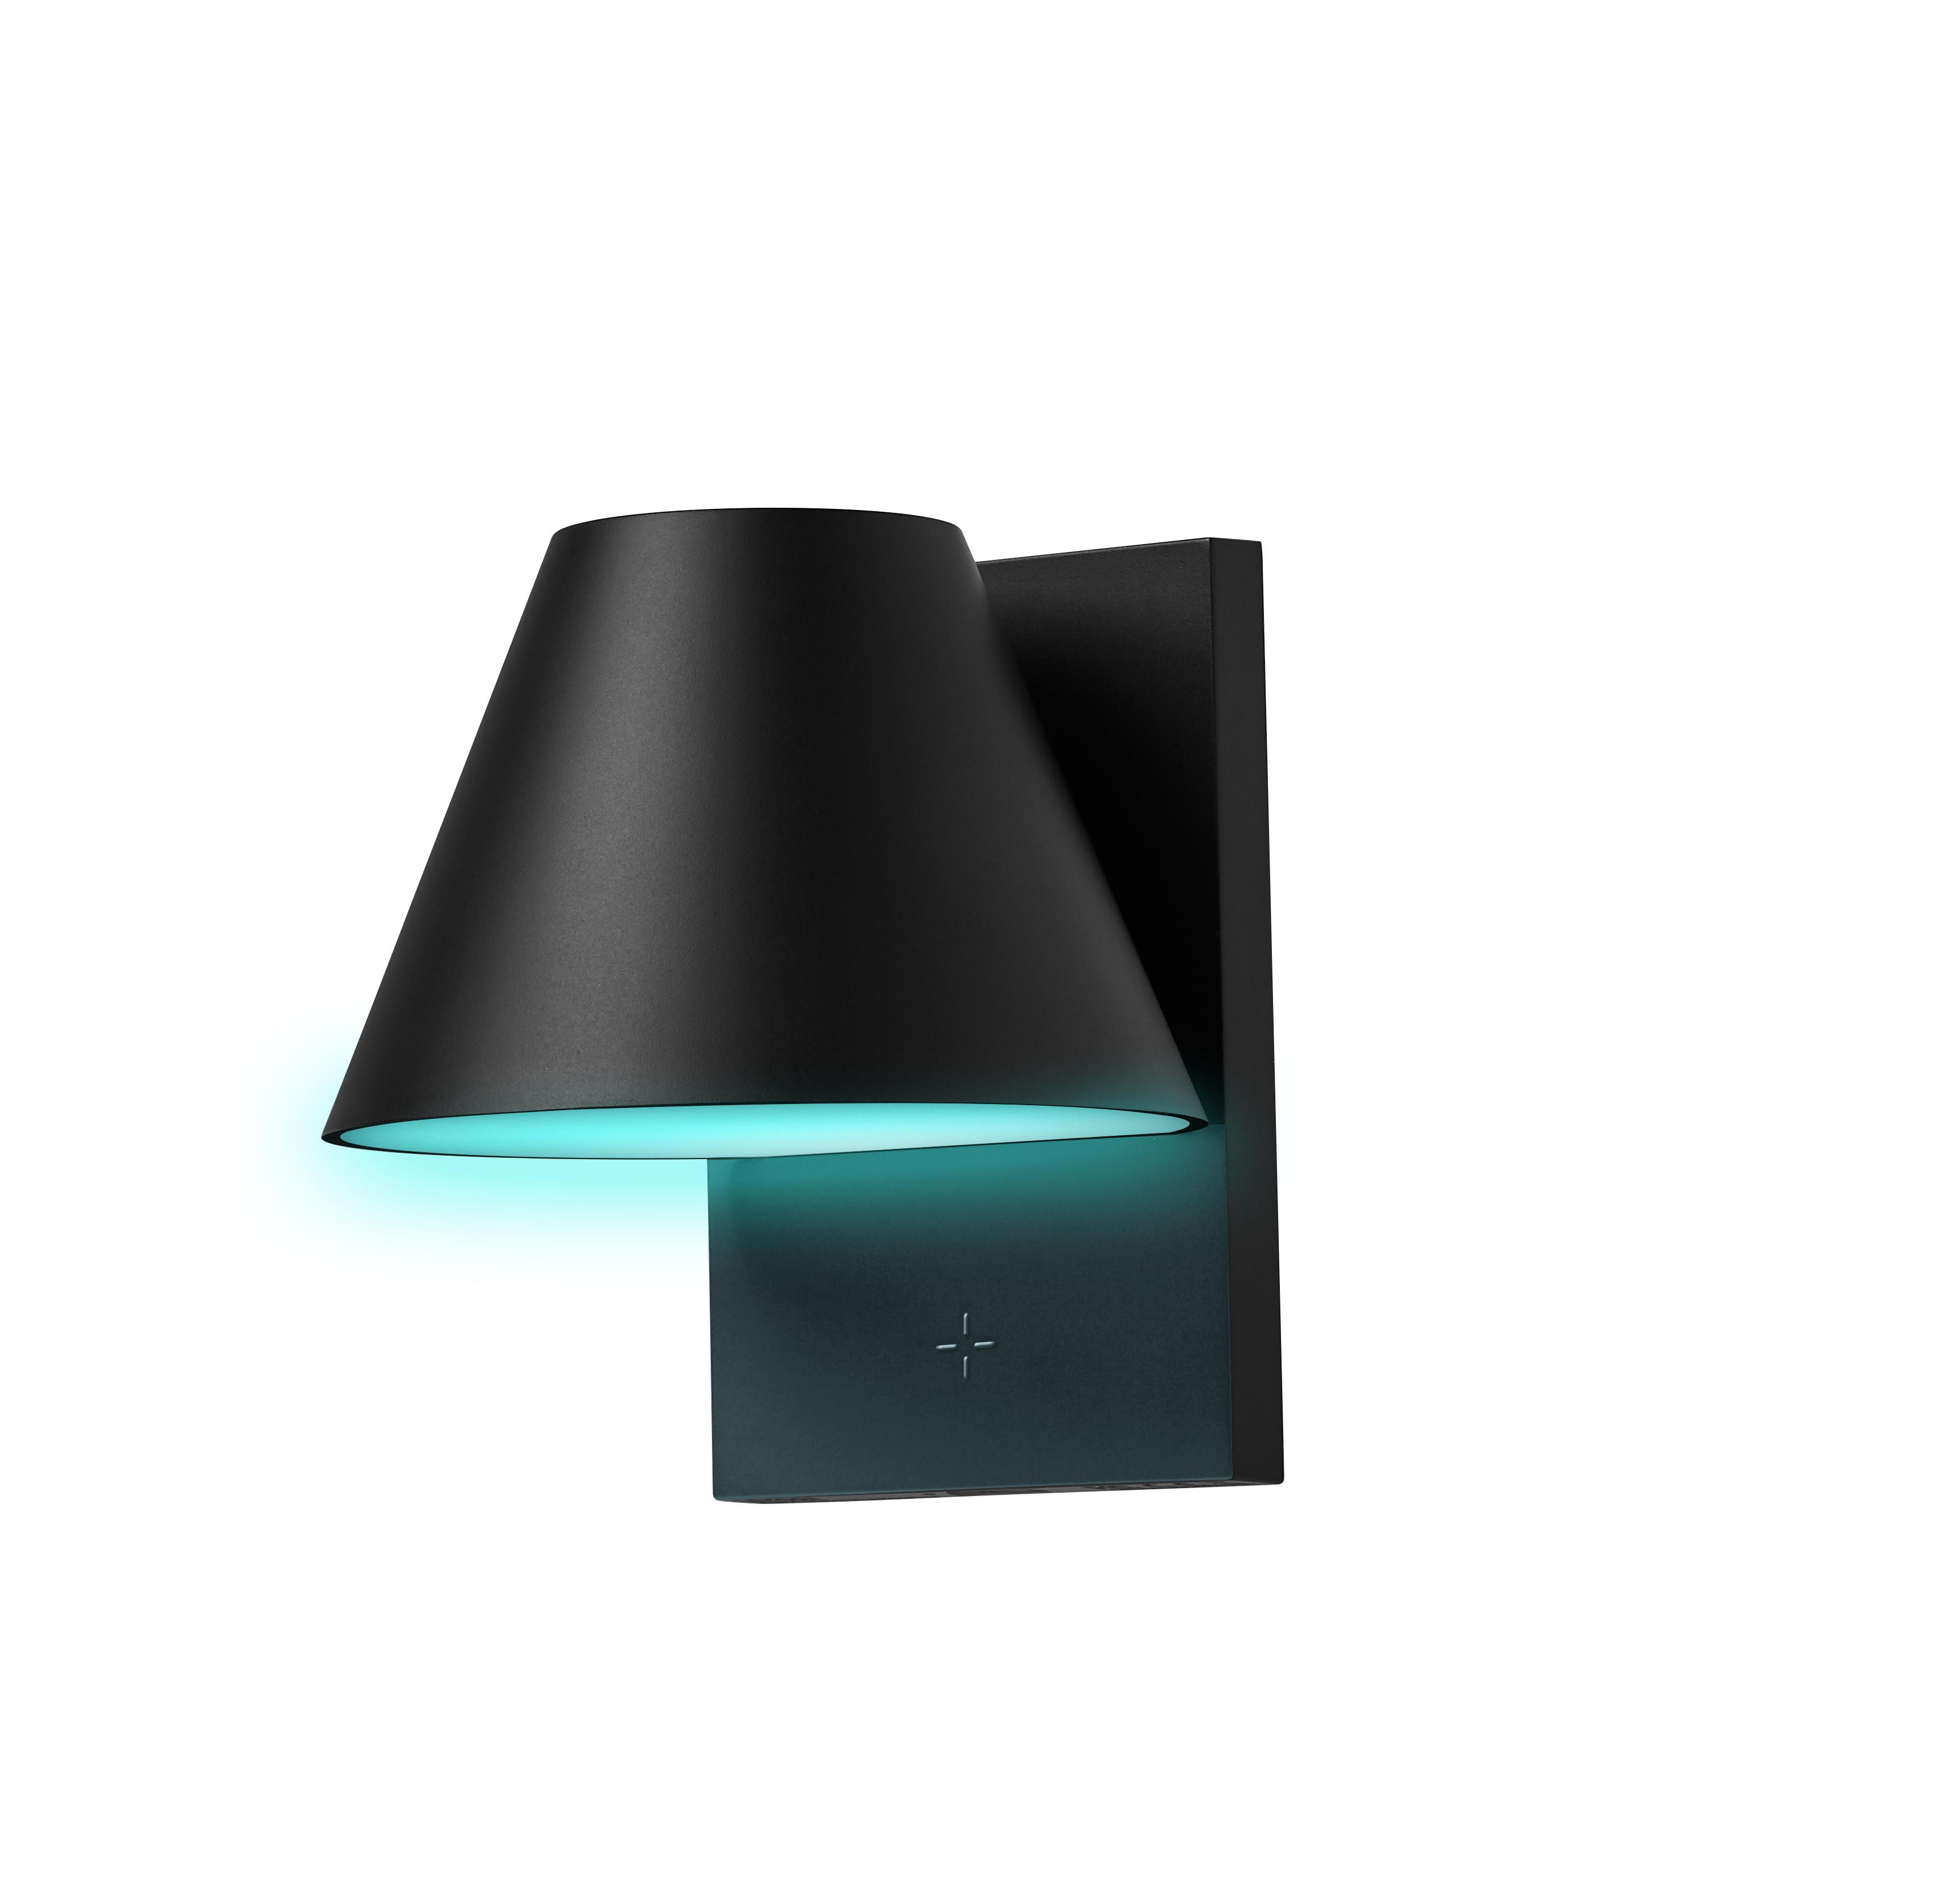 HELLONITE - LED Lampe mit Solarsensor